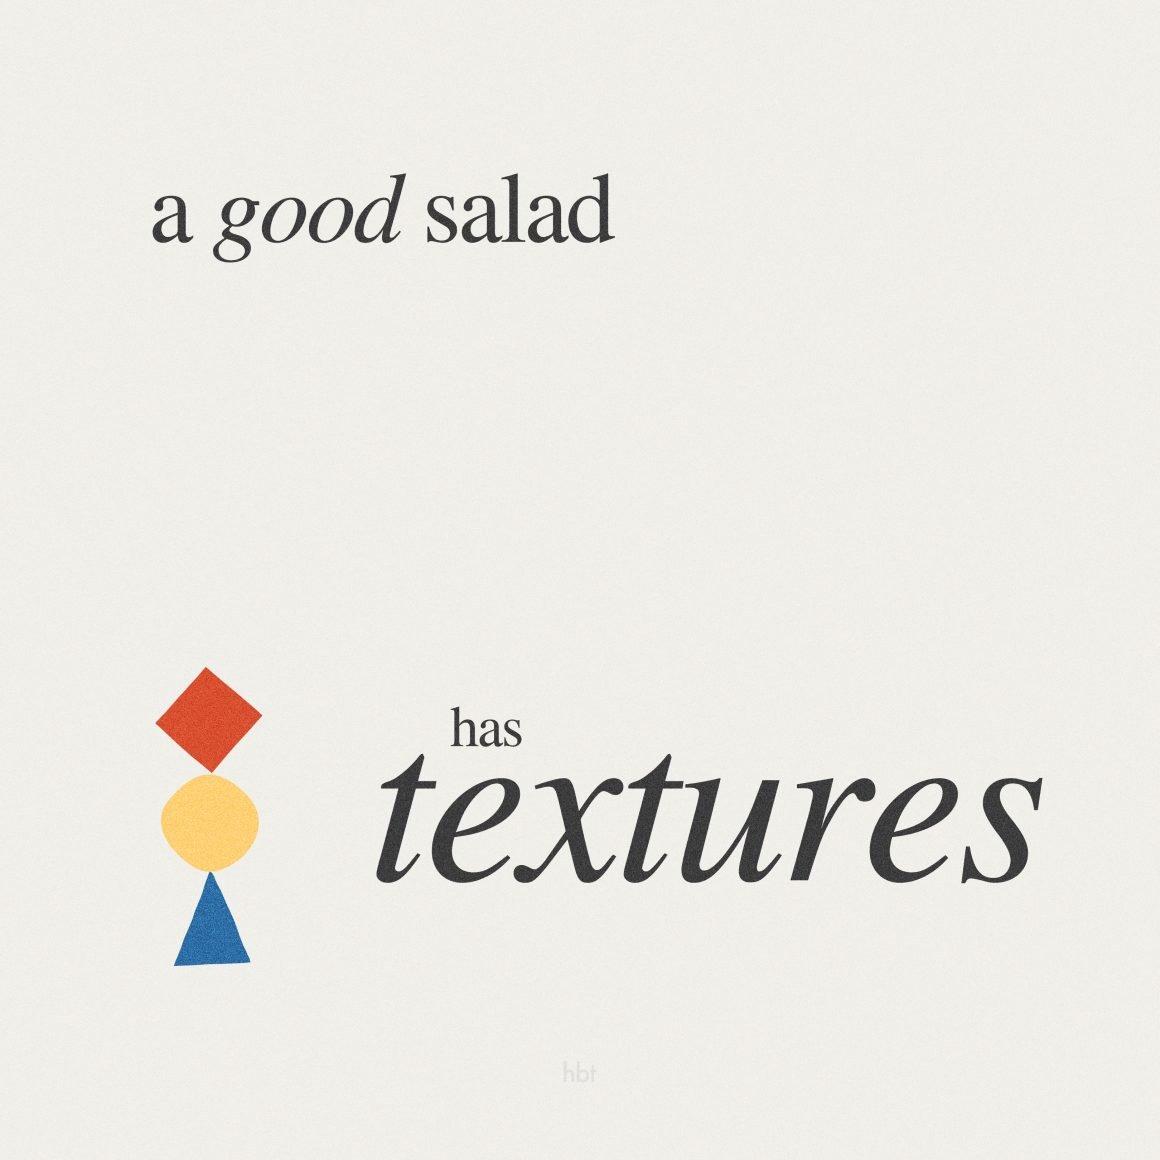 How to Make a Good Salad